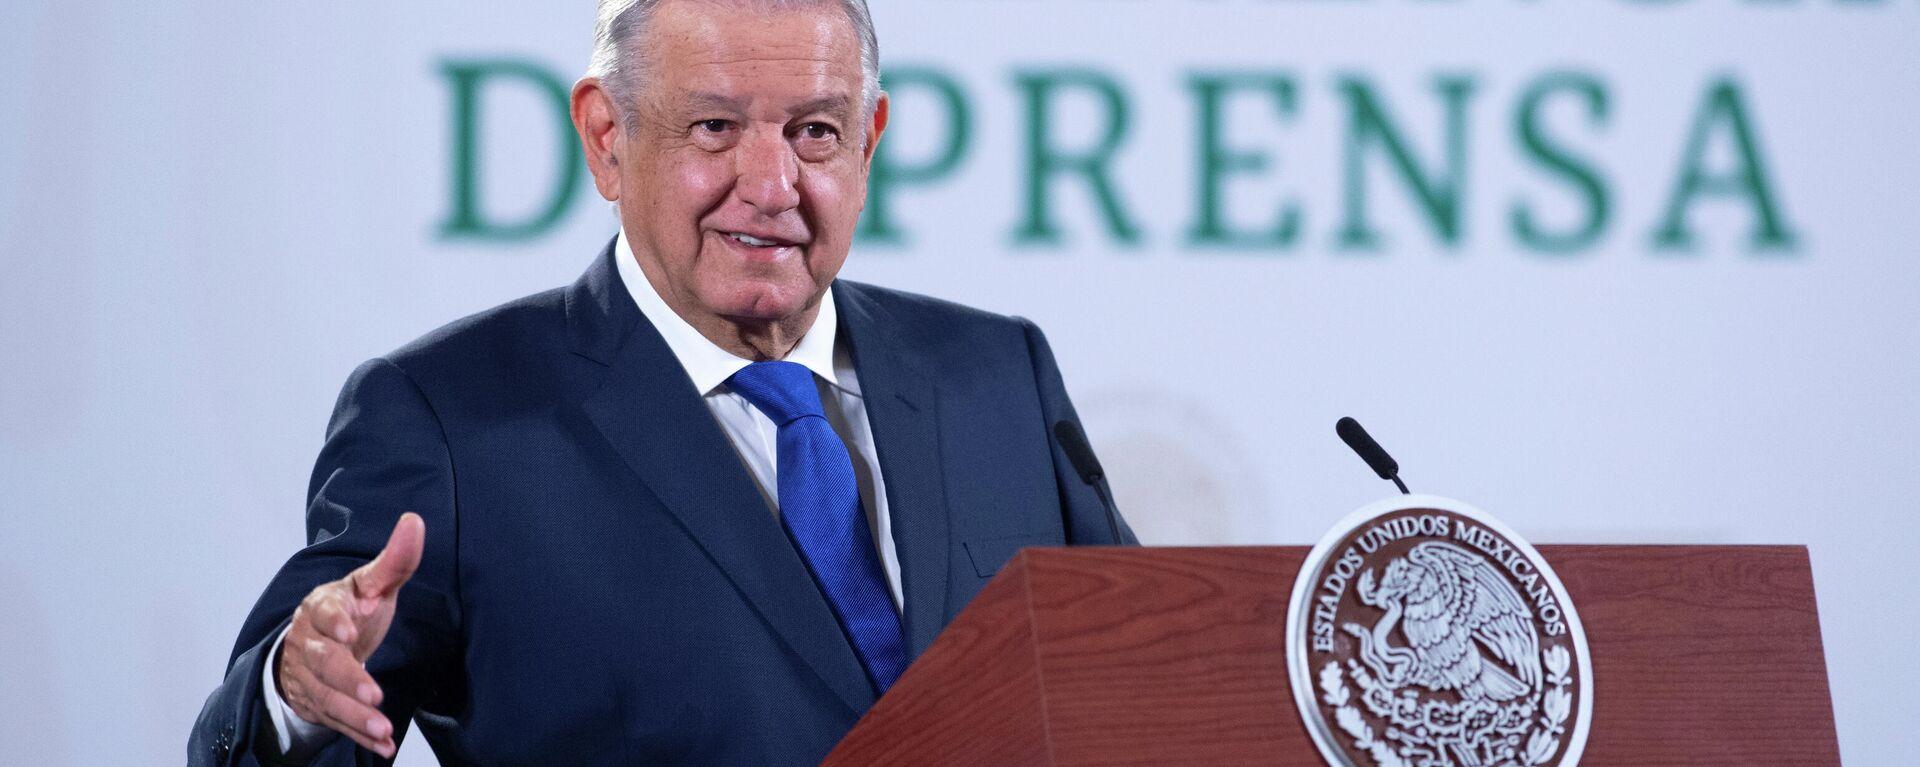 El presidente de México, AMLO - Sputnik Mundo, 1920, 01.09.2021